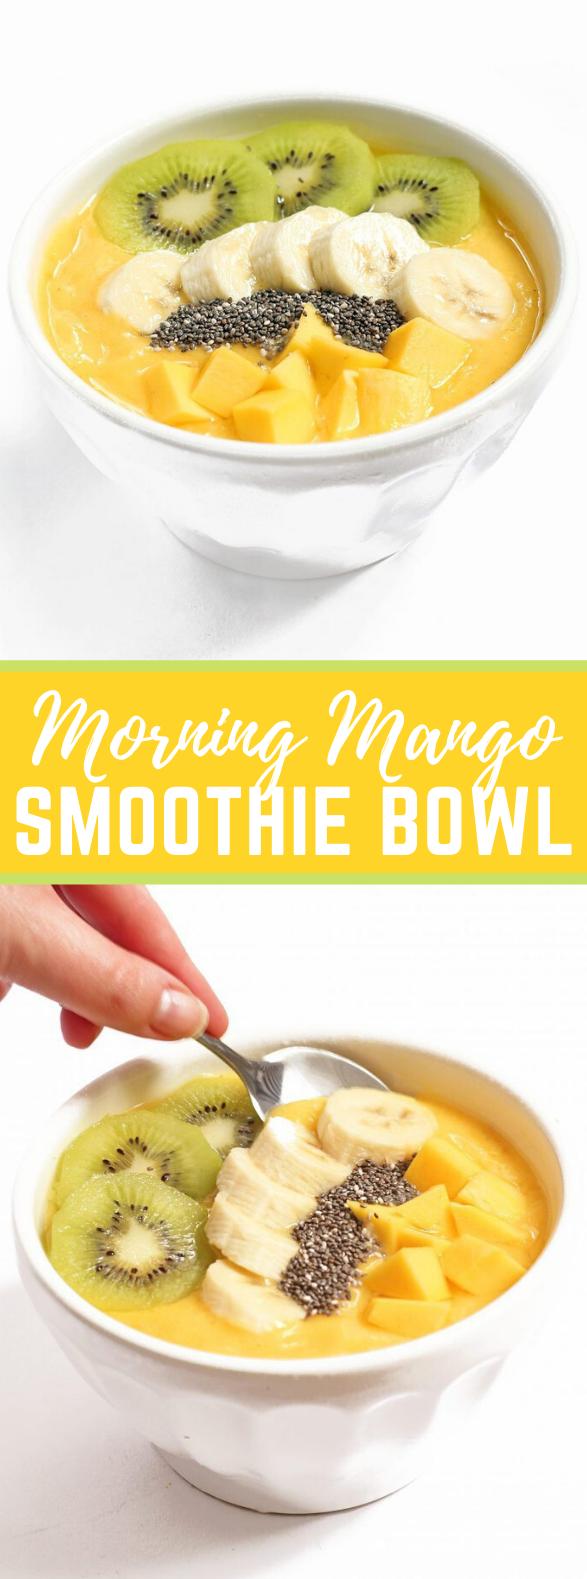 Morning Mango Smoothie Bowl #healthy #breakfast